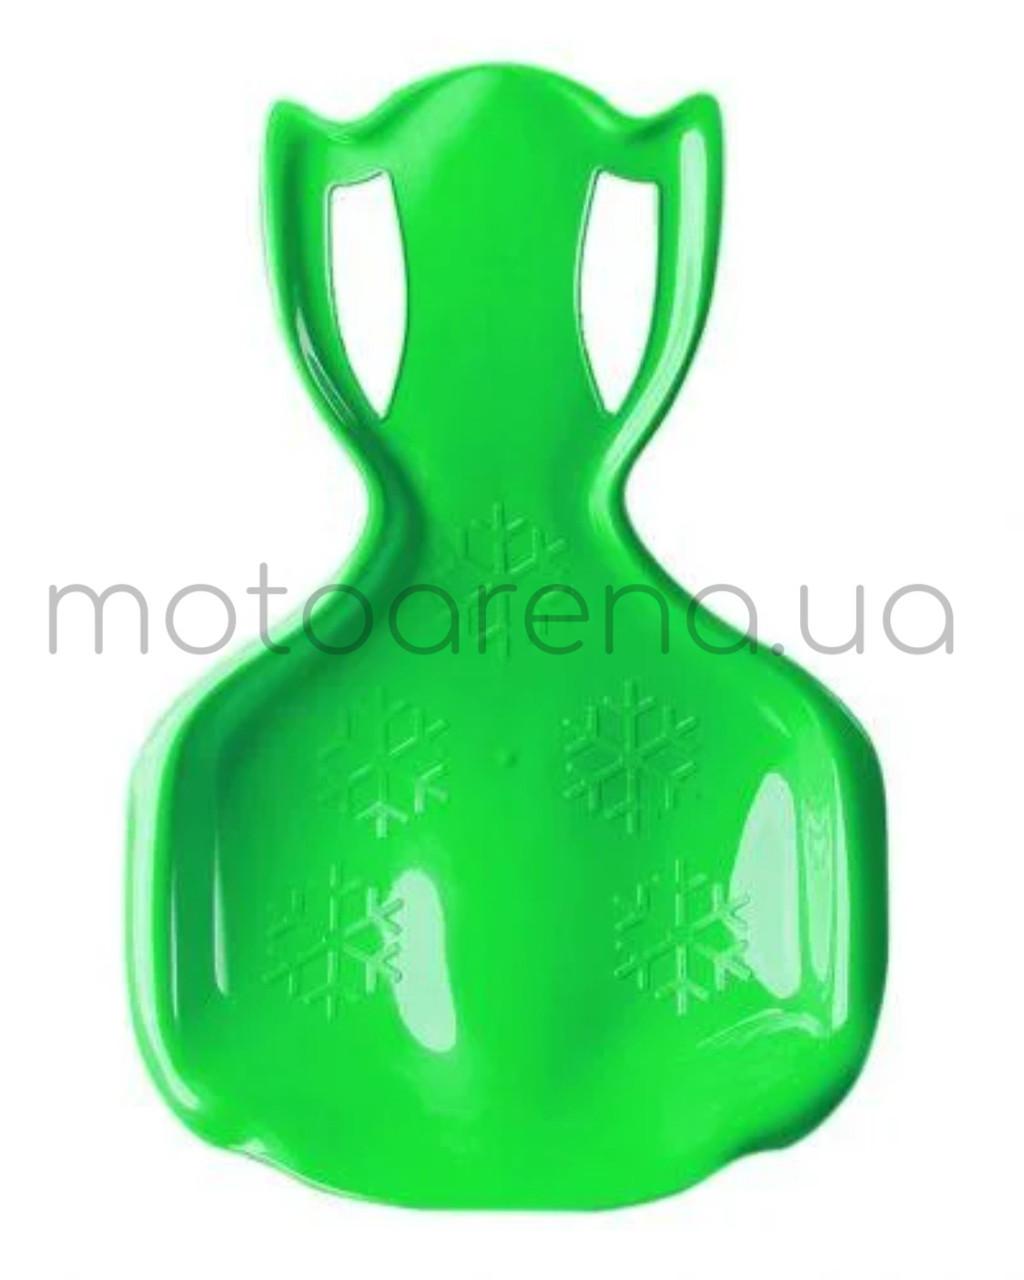 Ледянка PAN SLADGE (зелёная )